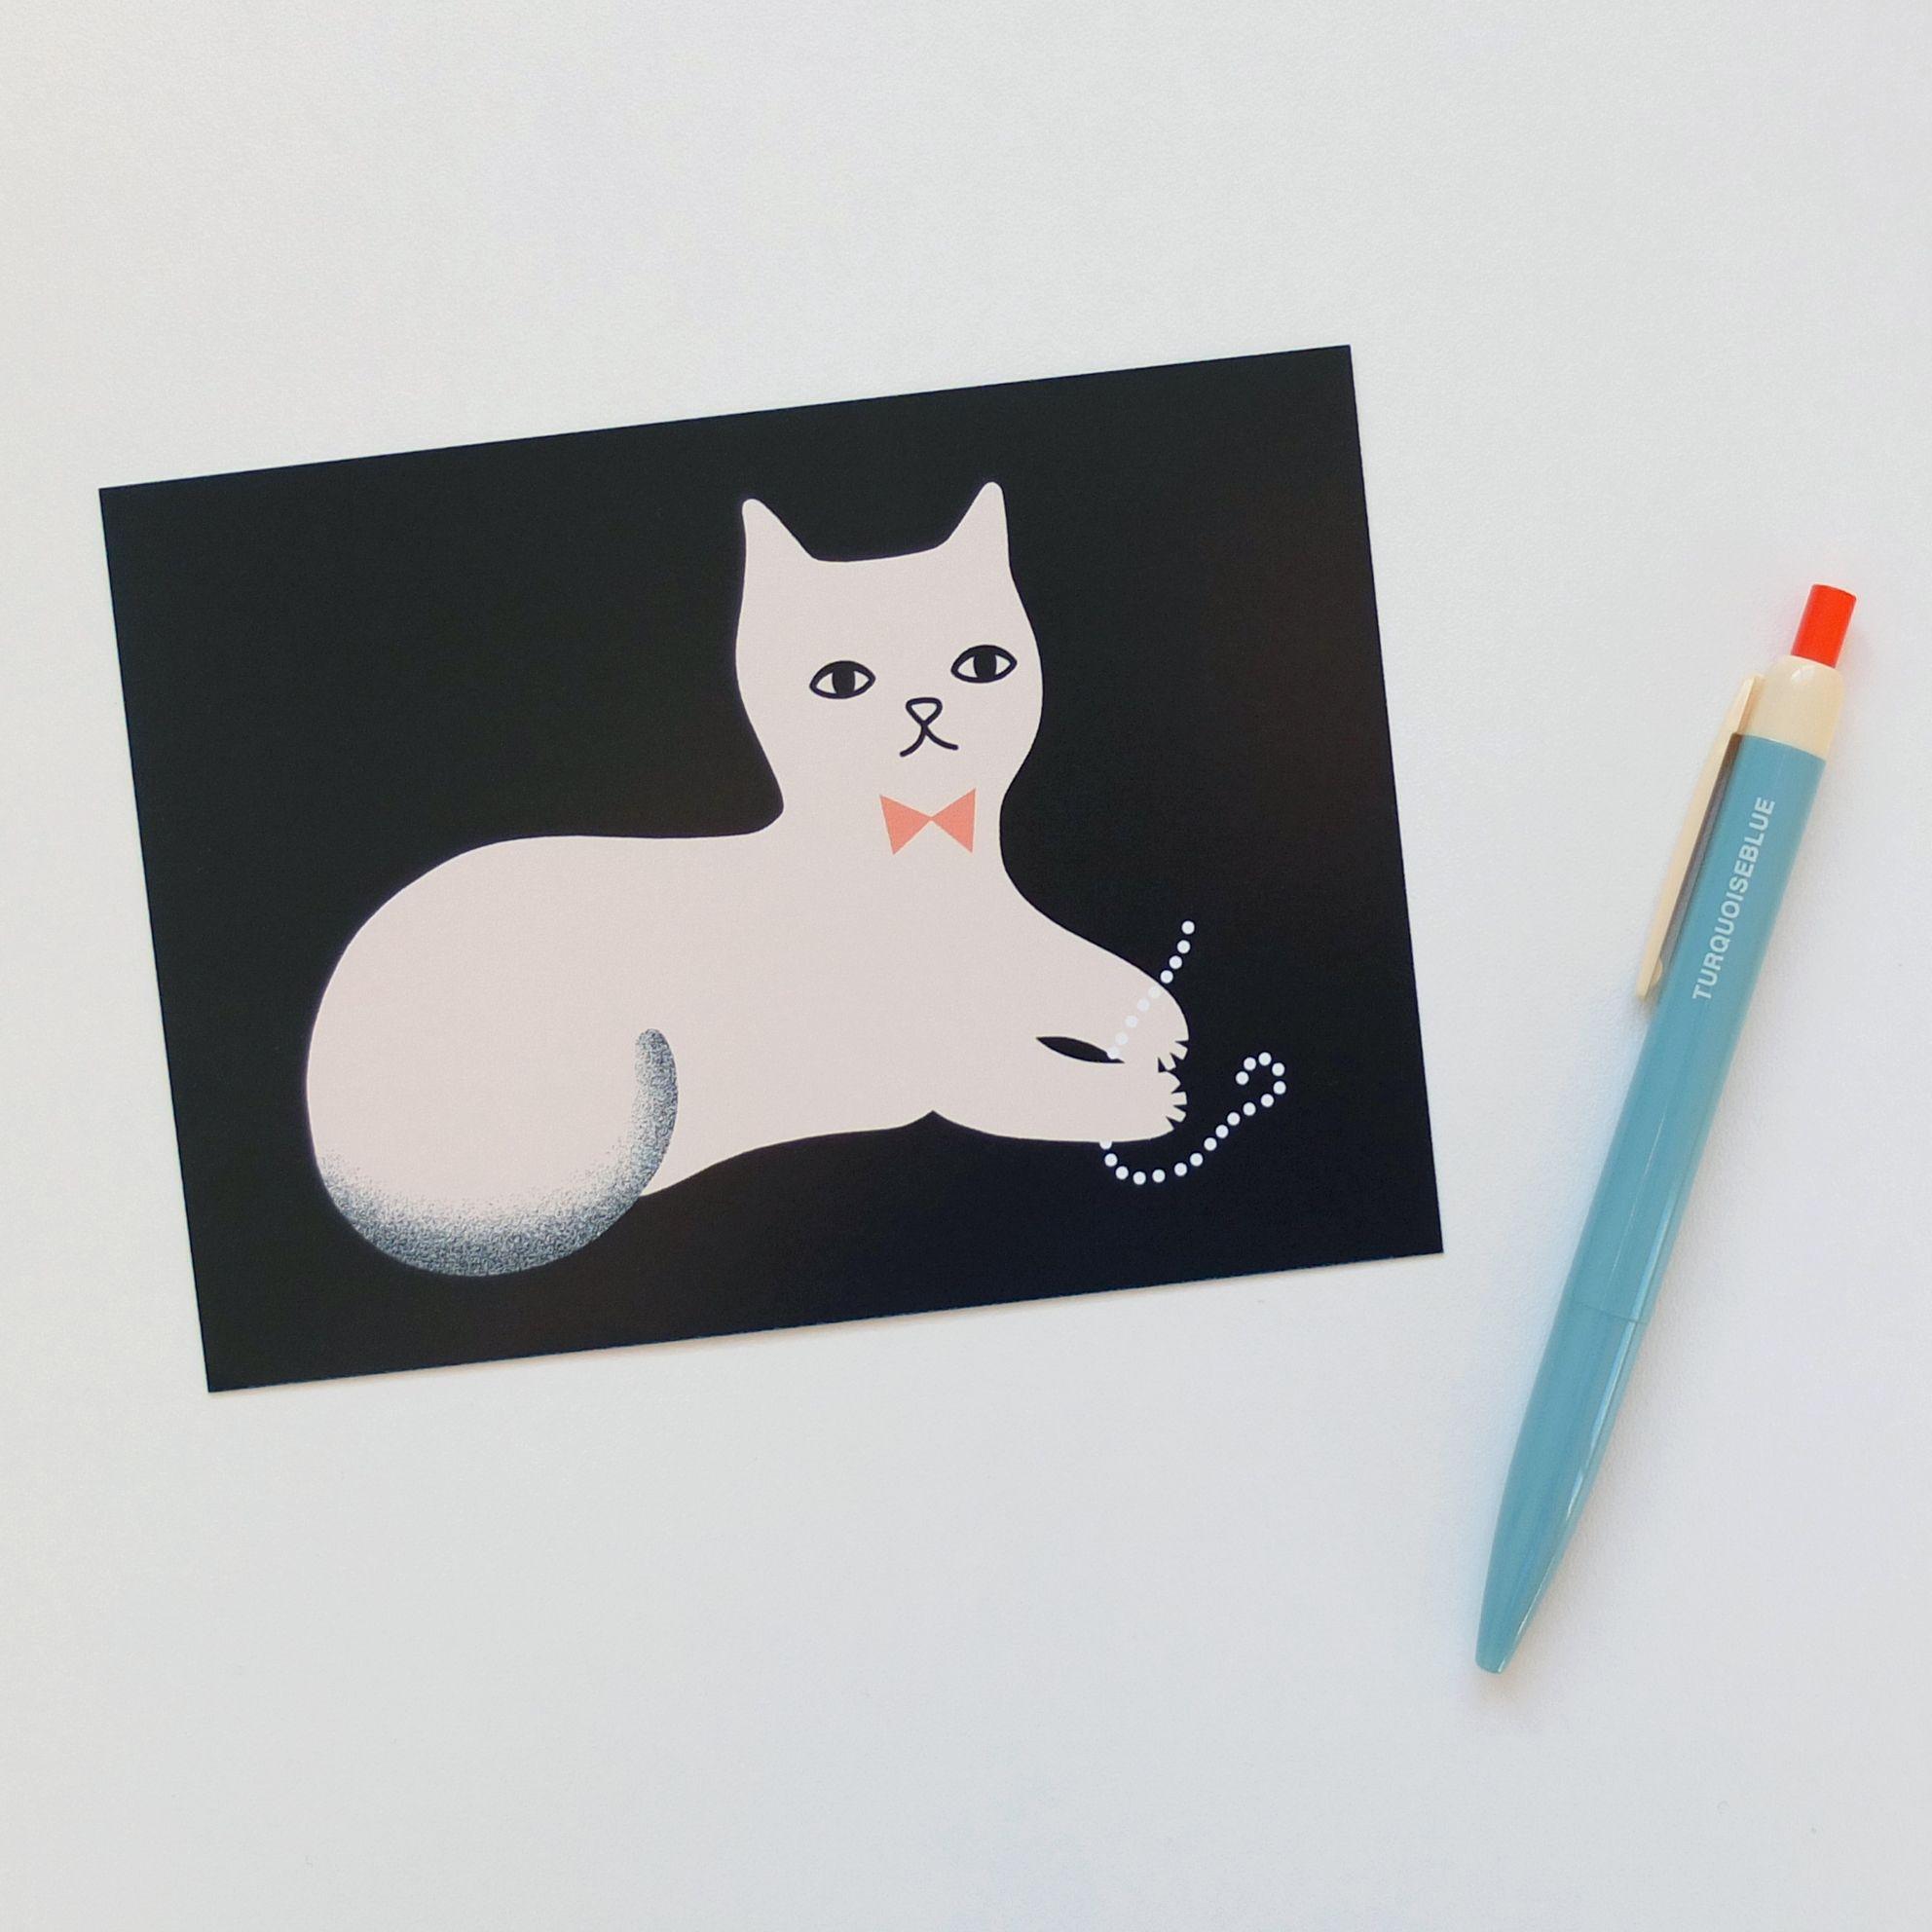 postcard - Audrey Jeanne